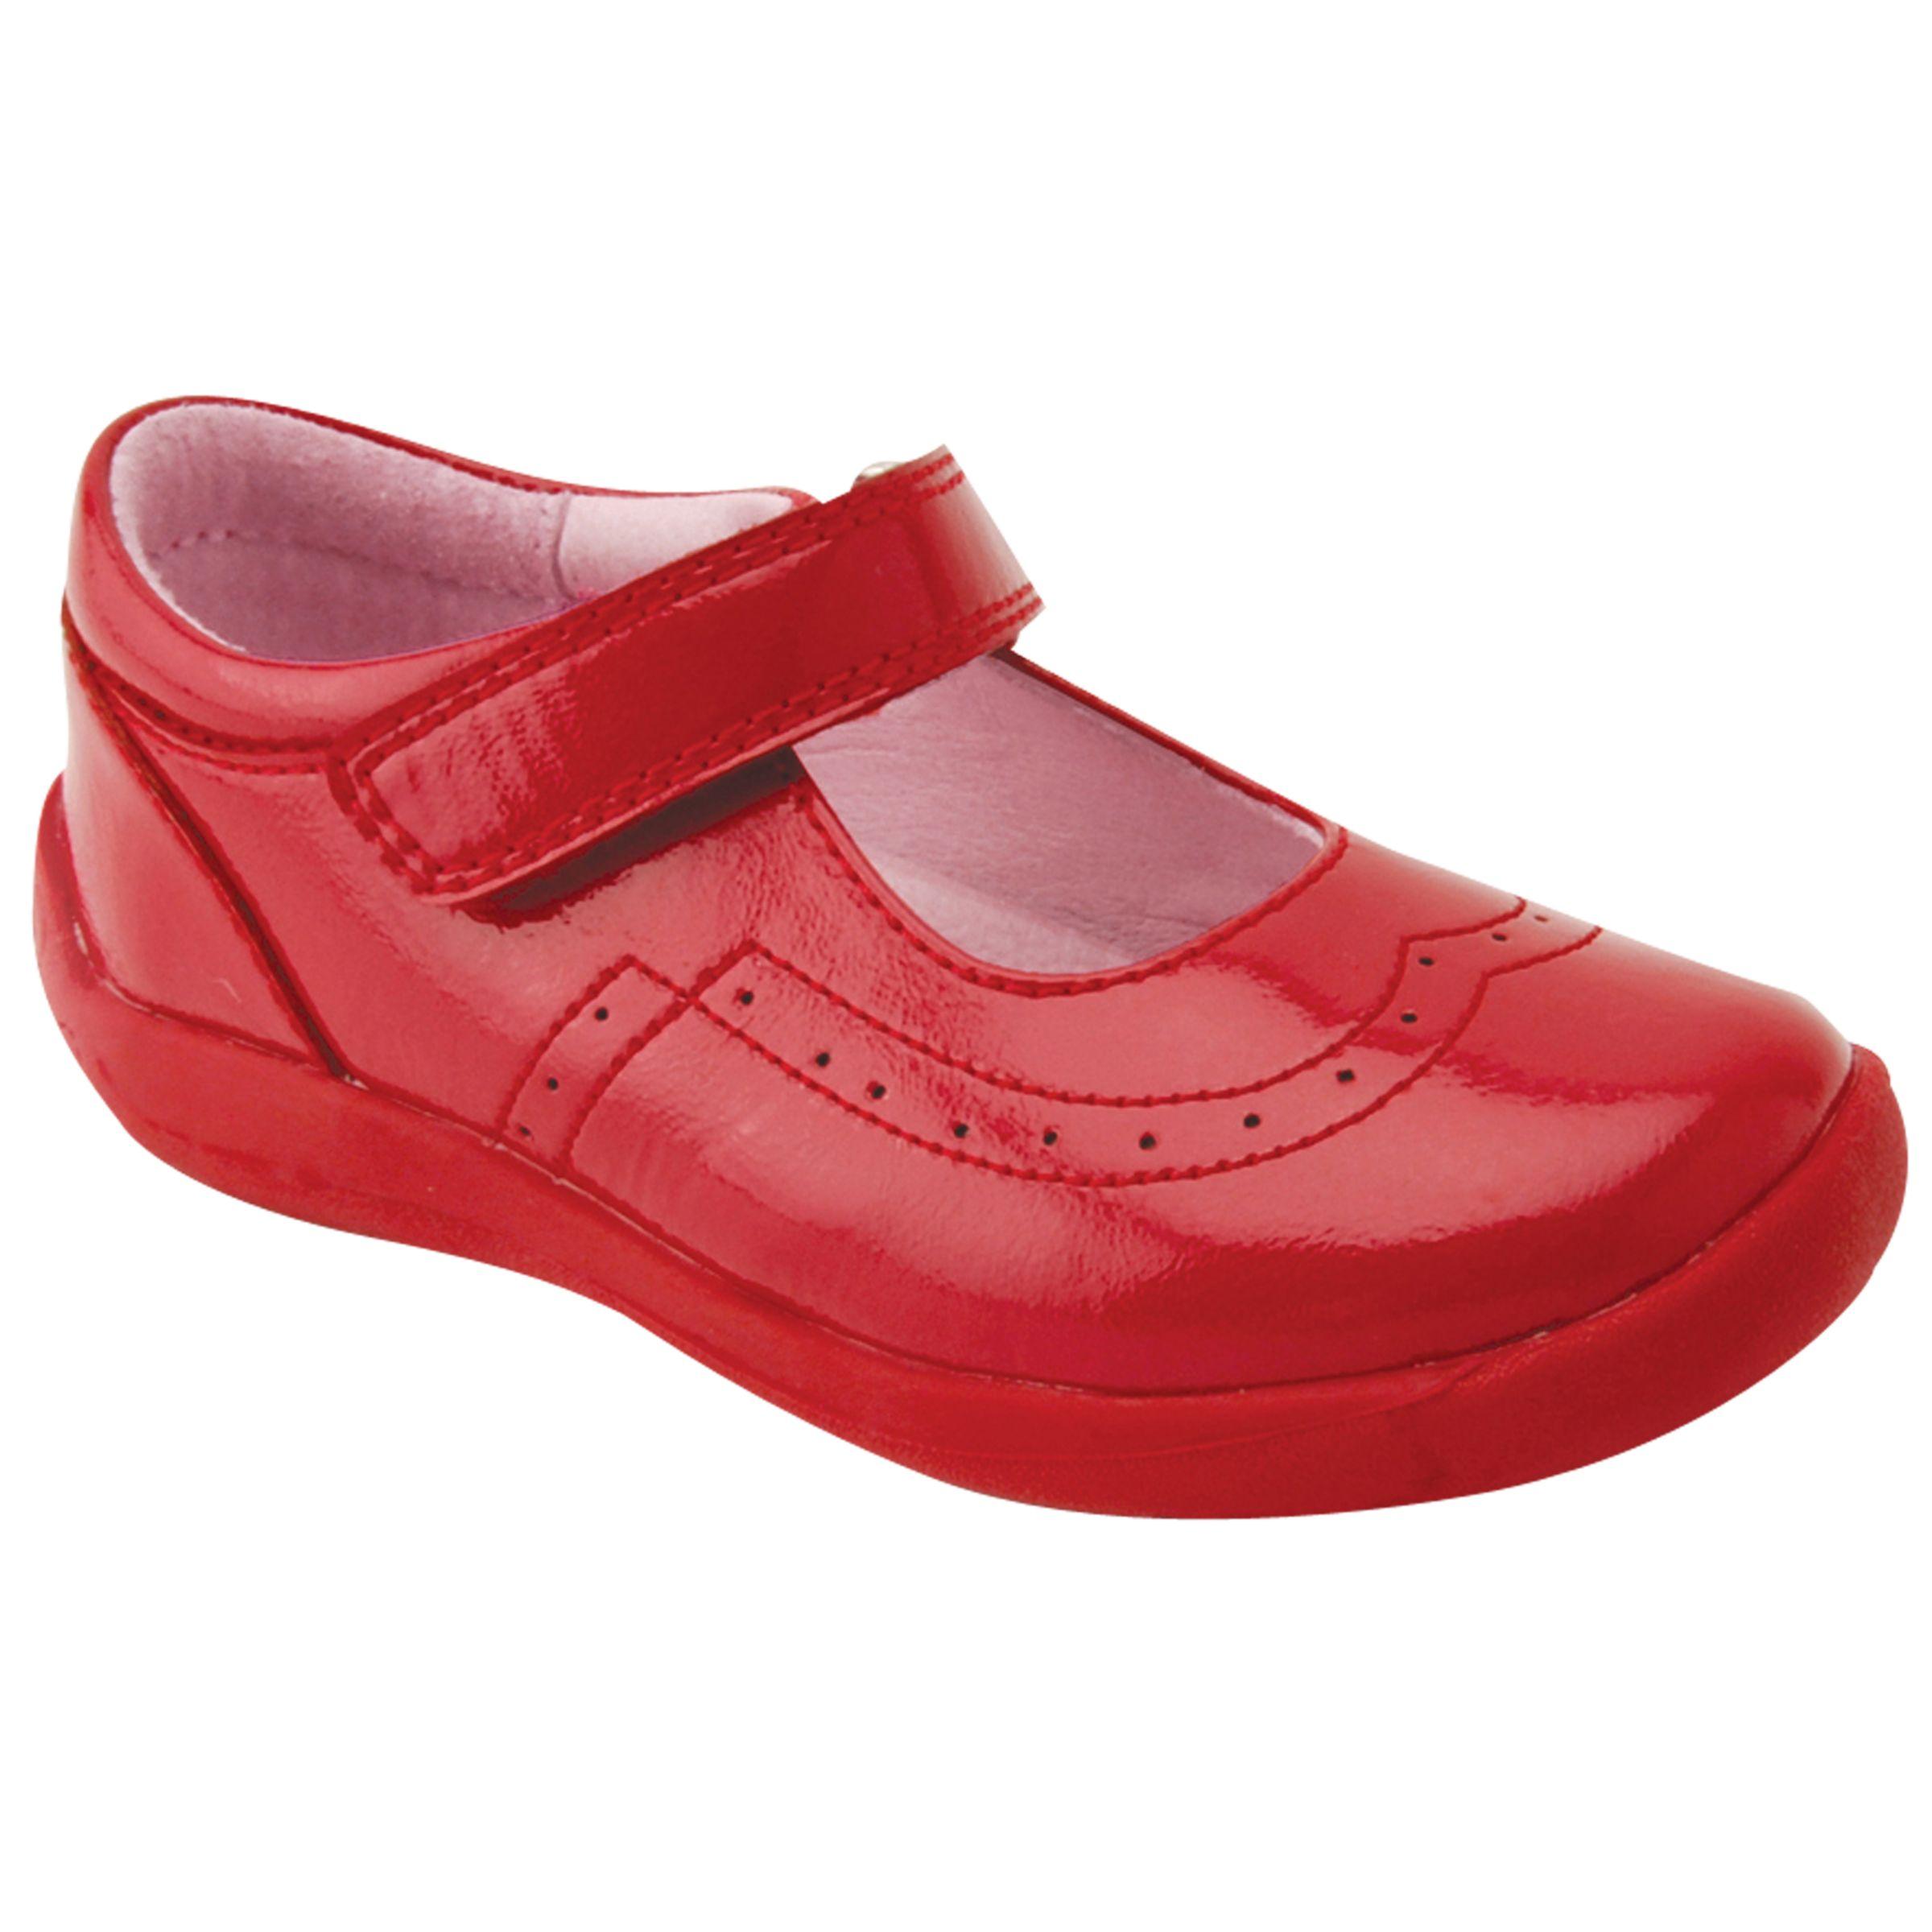 Start-Rite Start-rite Children's Soft Alice Riptape Shoe, Red Patent